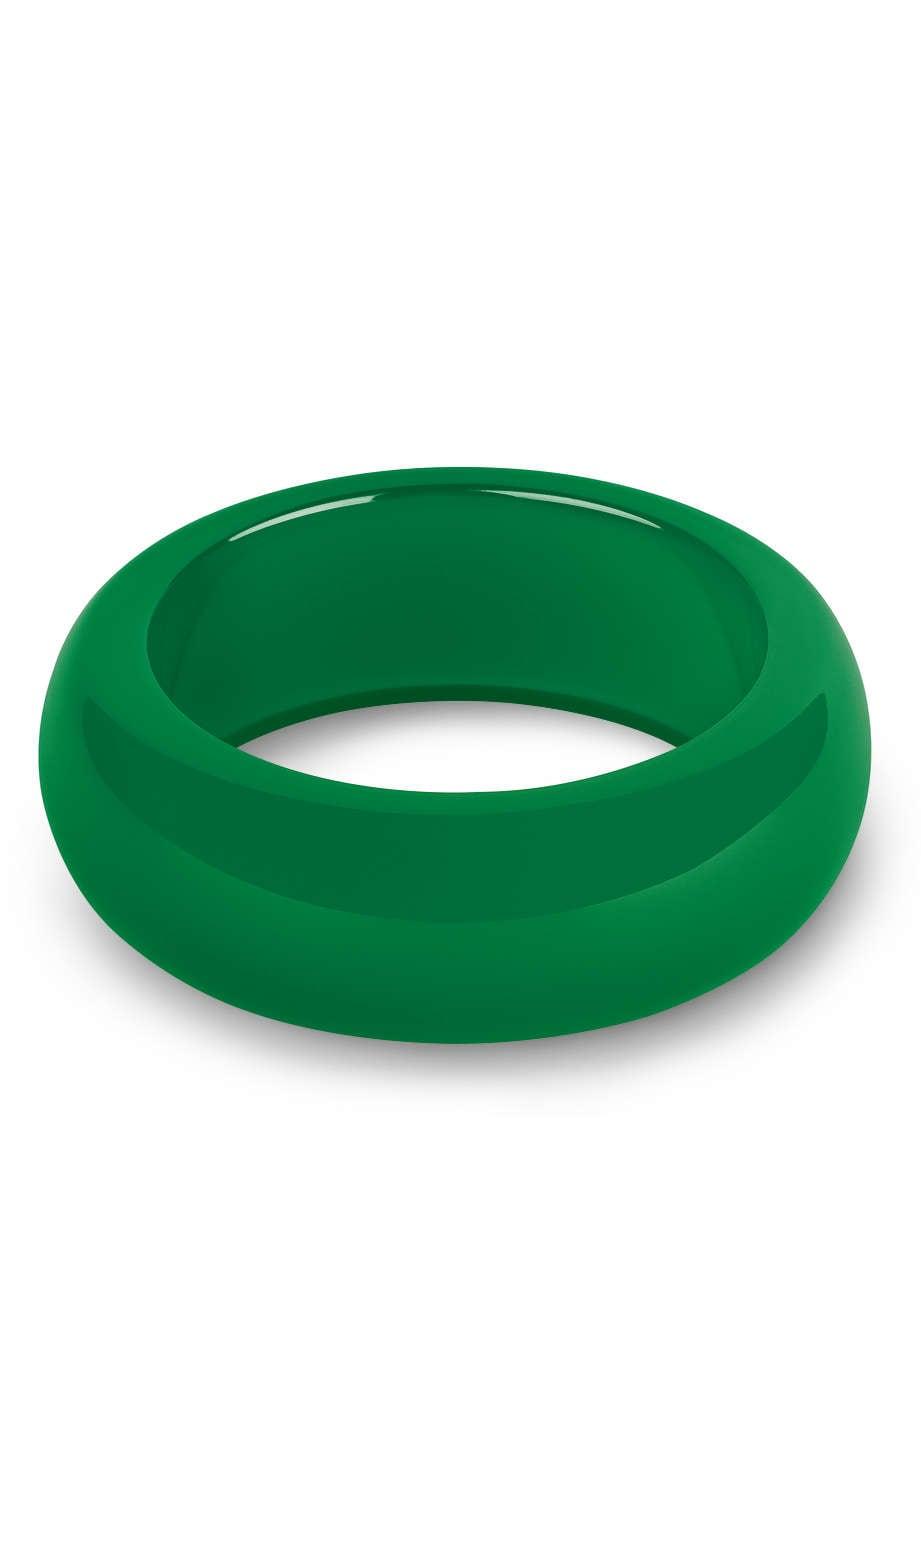 Swatch - REBEL BANGLES GREEN - 1